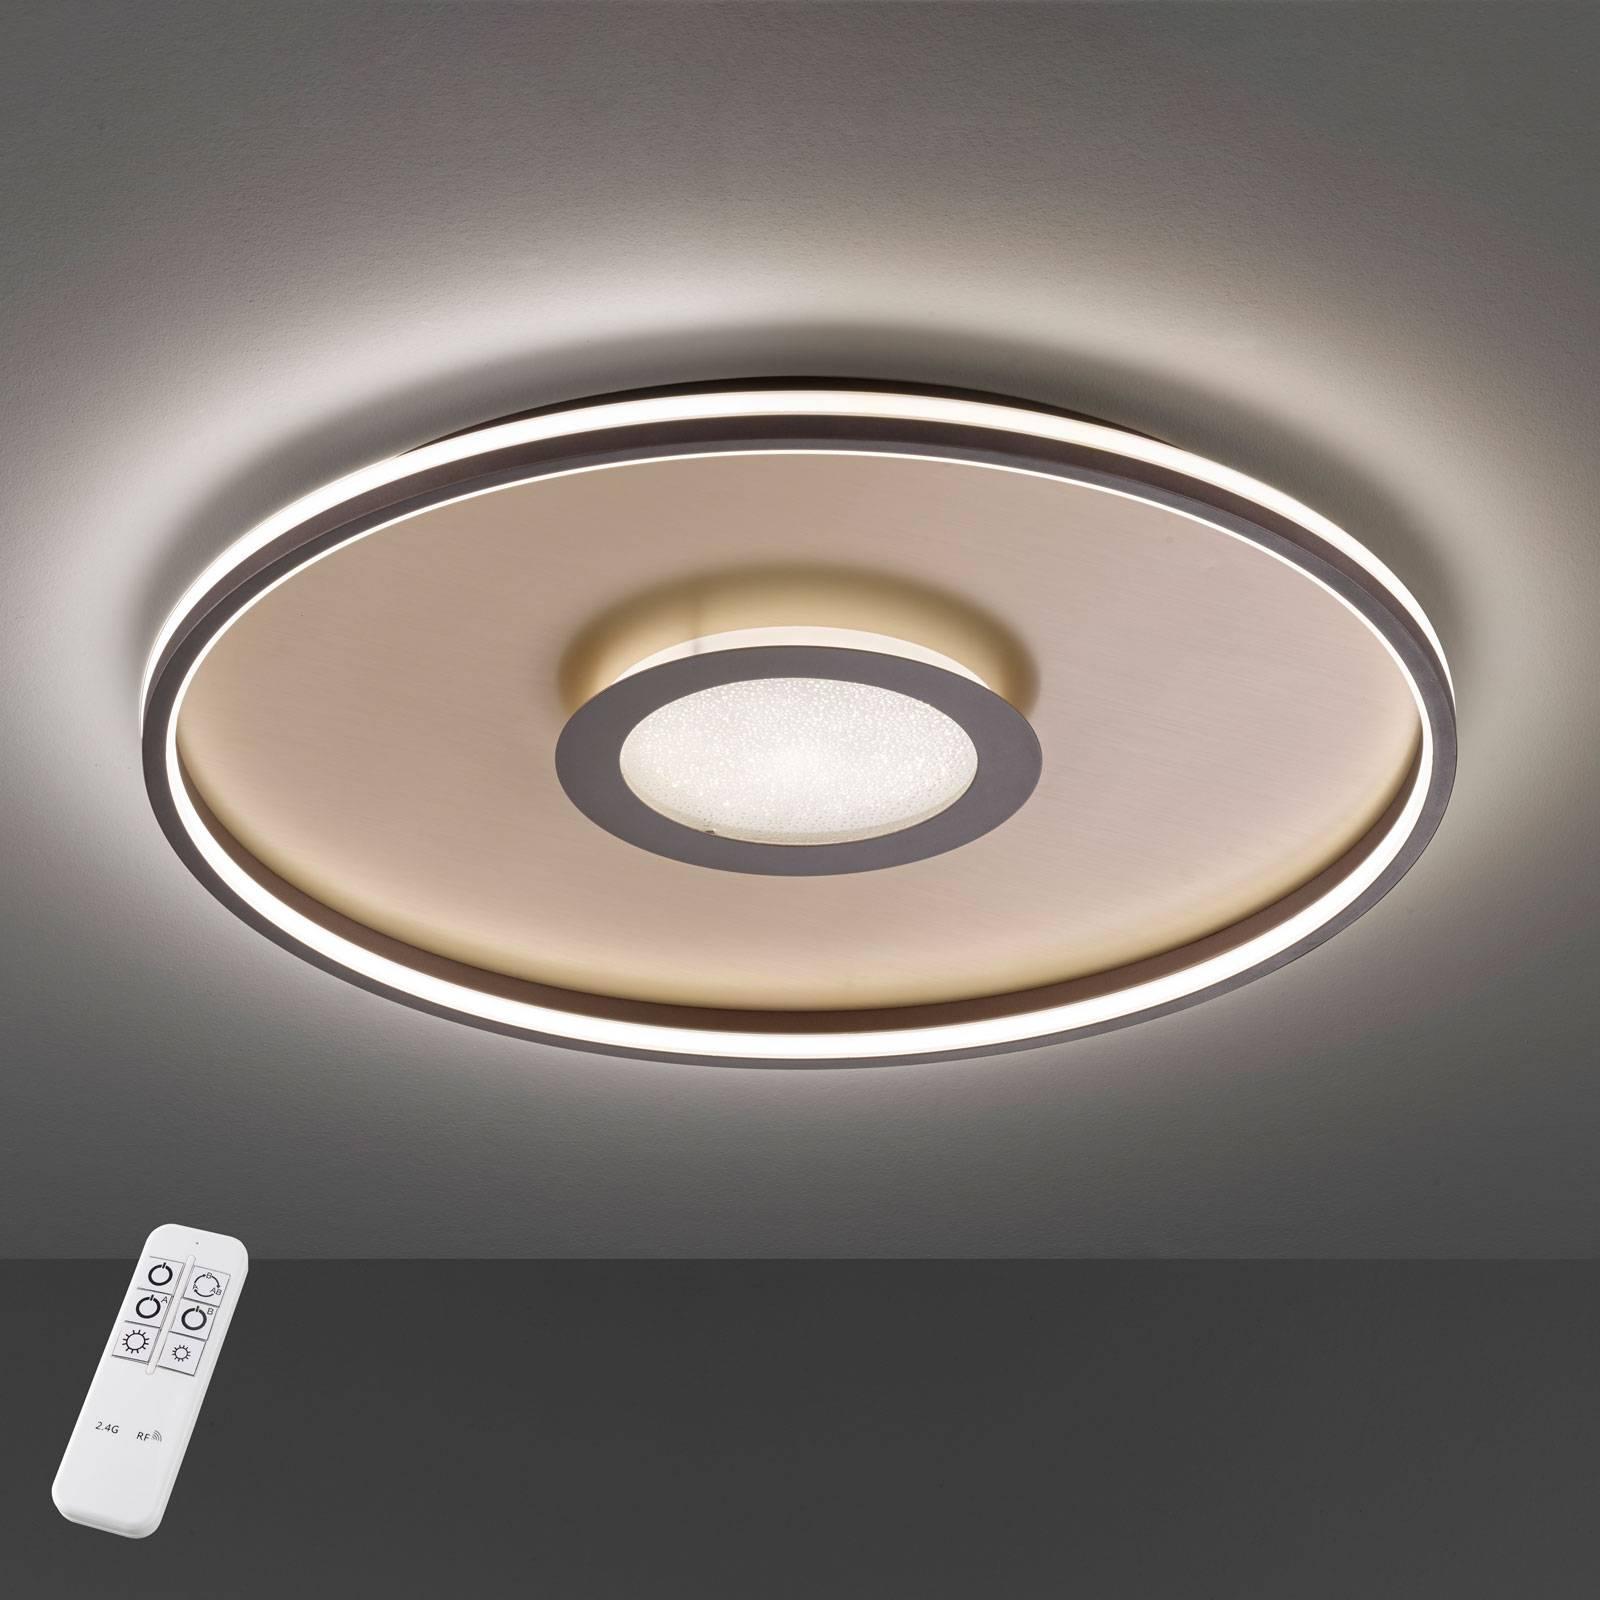 Lampa sufitowa LED Bug okrągła, rdza 60cm